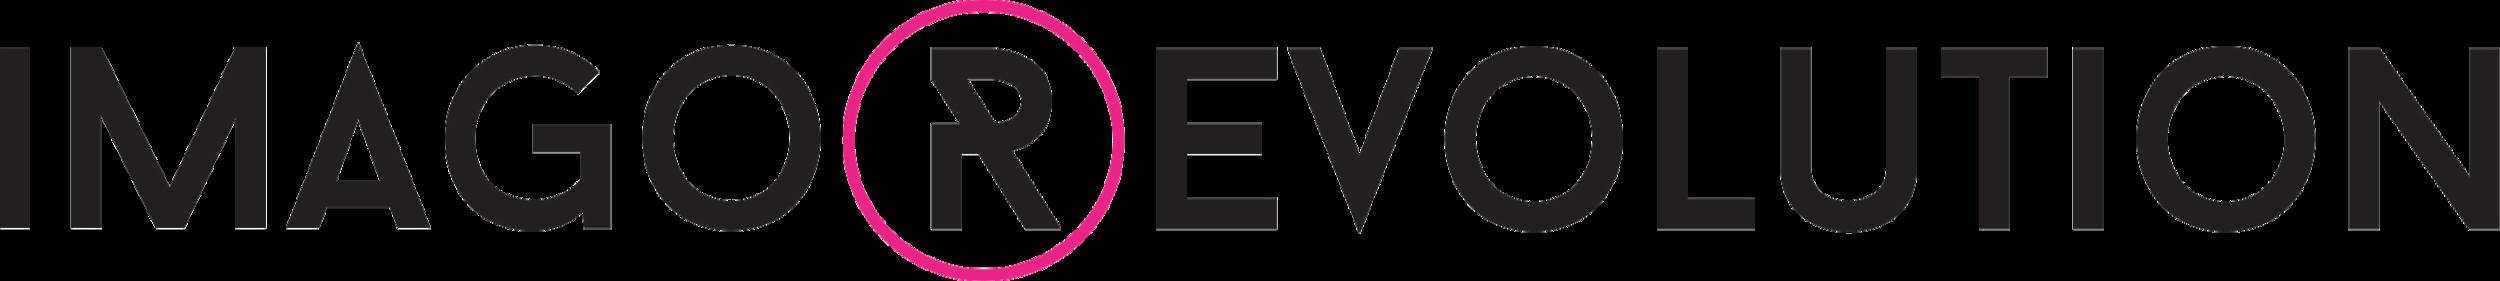 cropped-logo-1-5.png